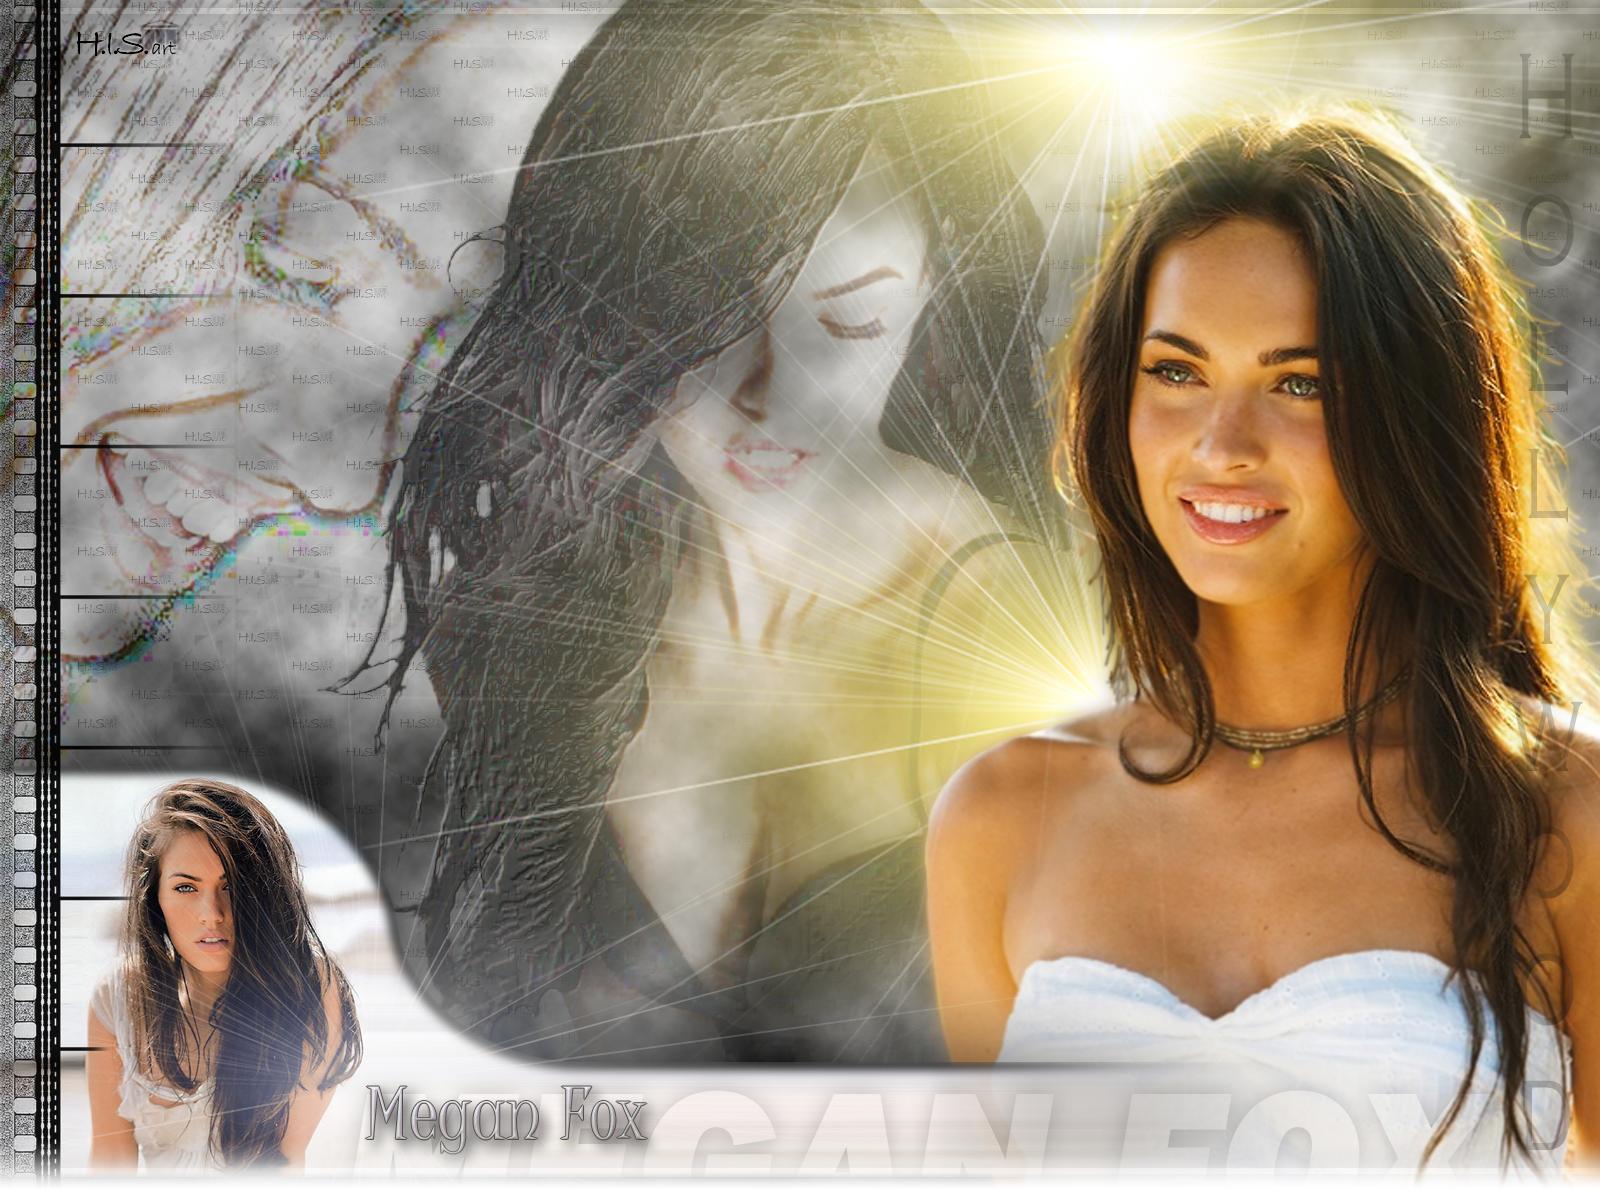 http://2.bp.blogspot.com/-h0jMVTGG1CY/ThH_fKLsqLI/AAAAAAAAAB4/WPfBuHVPKkg/s1600/Megan-Fox-Hot-Wallpapers-2.jpg